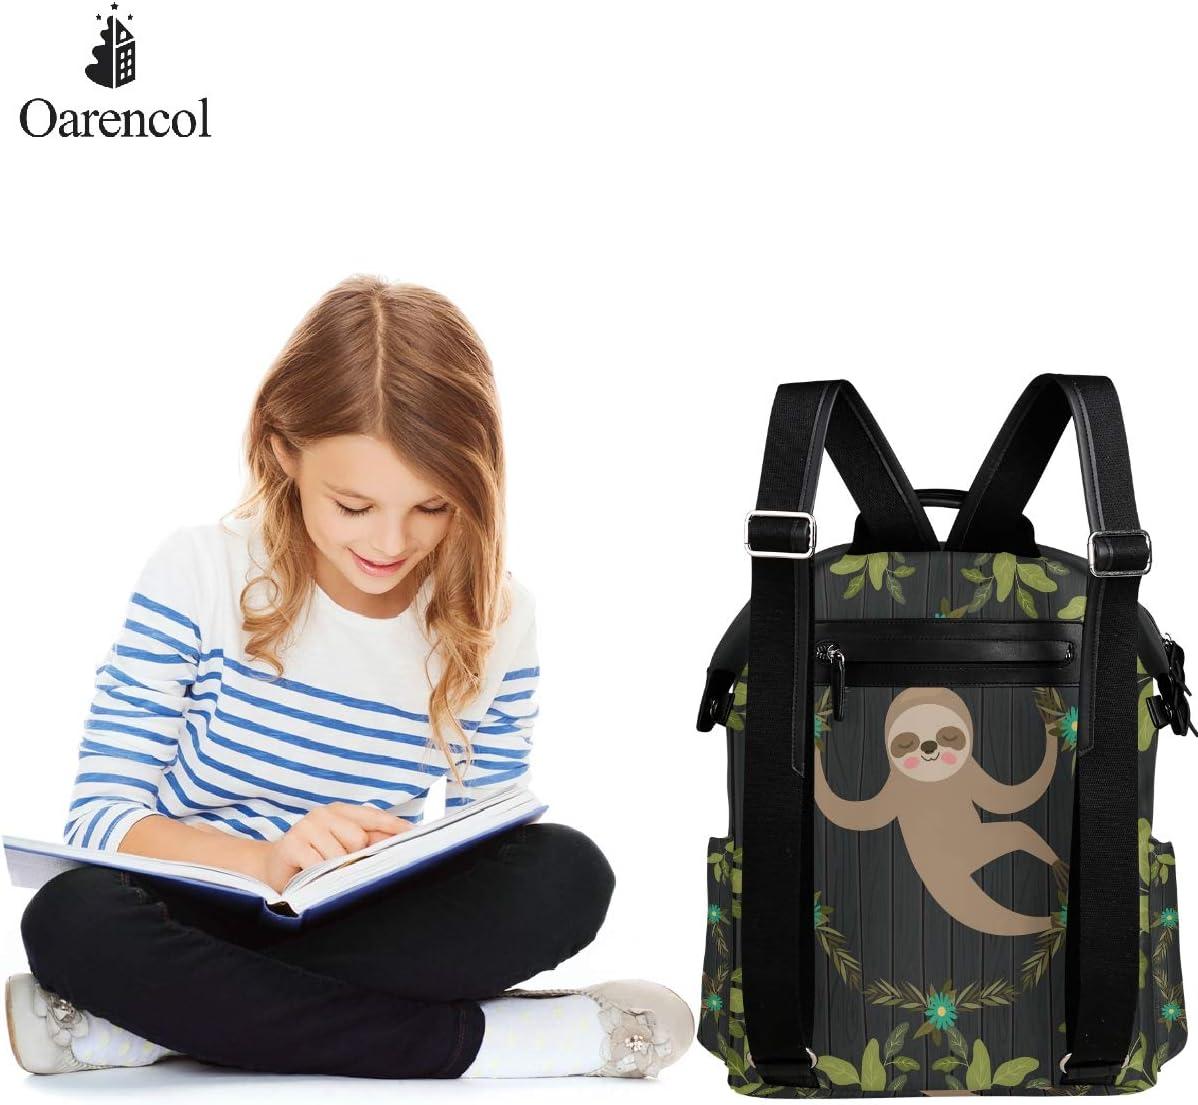 Oarencol Sloth Flower Garland Plank Green Leaves Cartoon Cute Animal Backpack School Book Bag Travel Hiking Camping Laptop Daypack